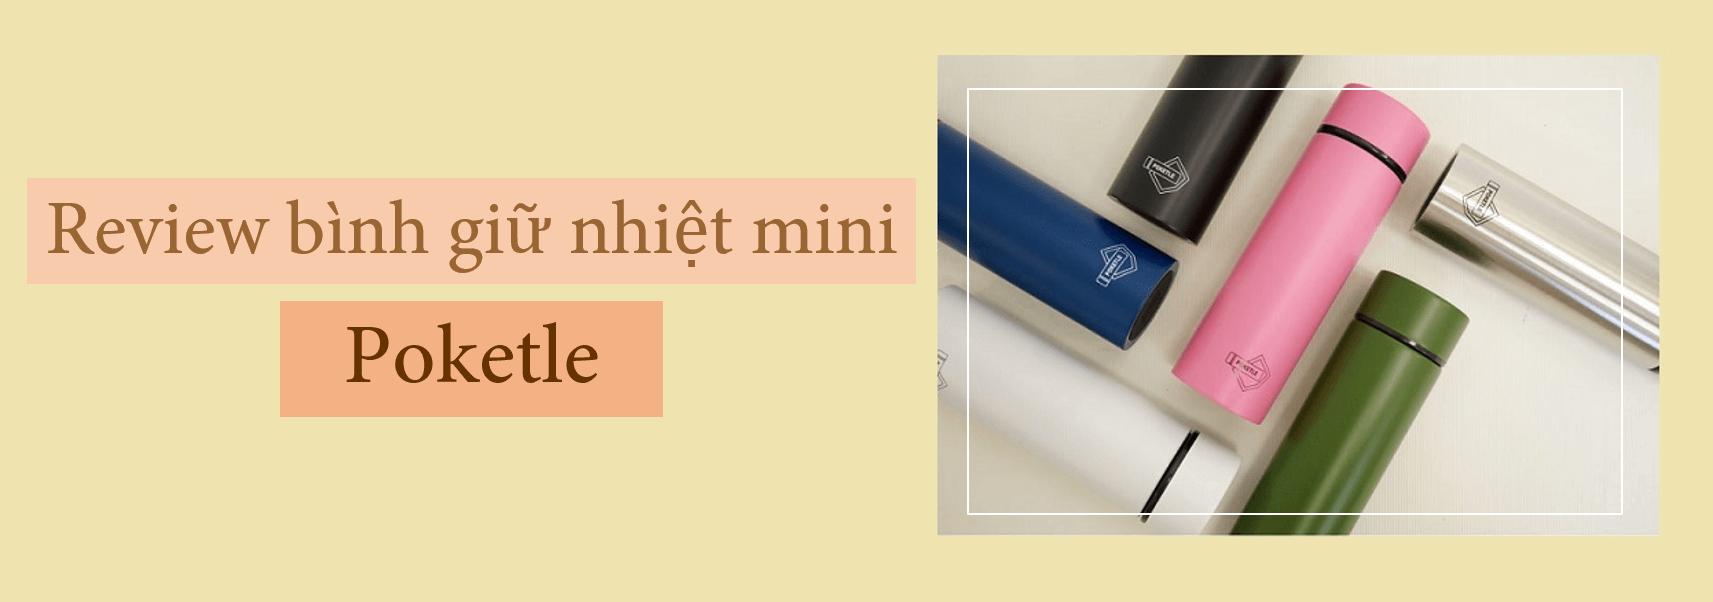 Bình giữ nhiệt mini Poketle